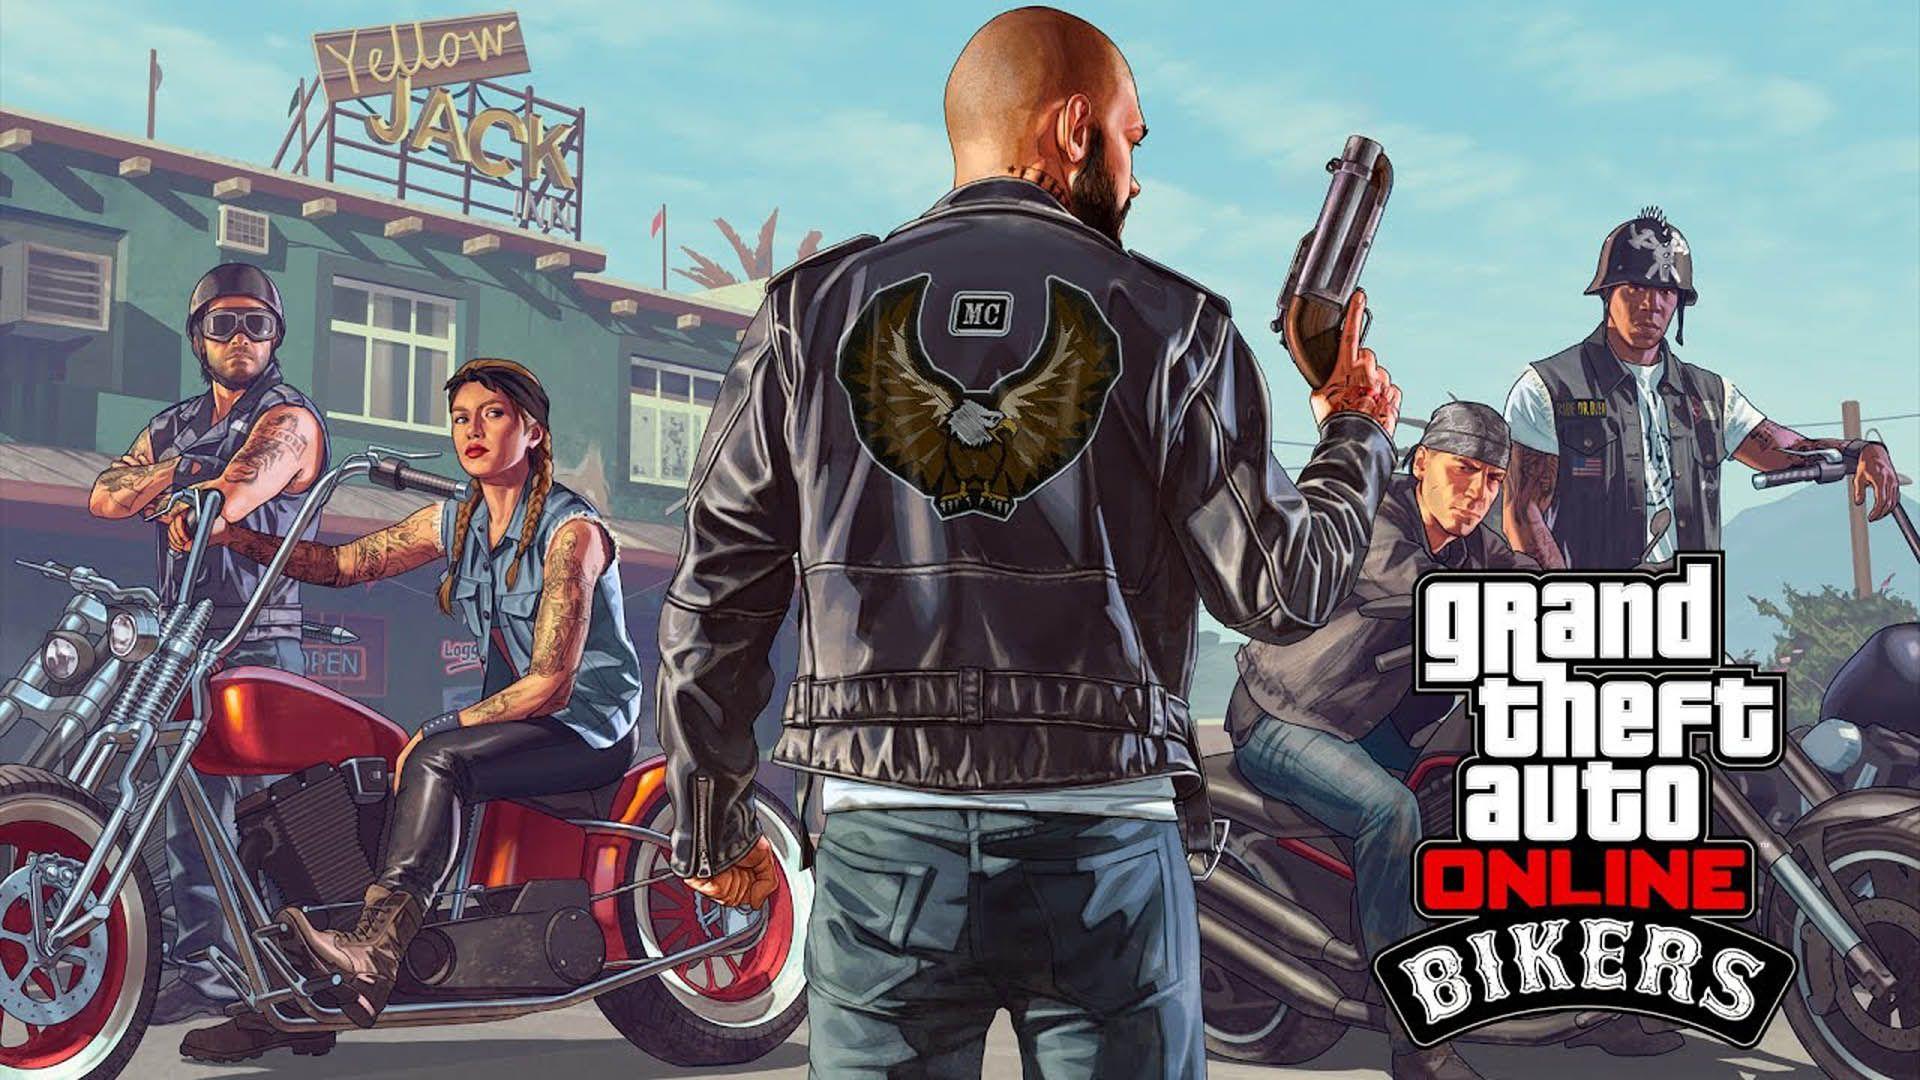 Bikers GTA 5 Online Update DLC 1920x1080 wallpaper Boy